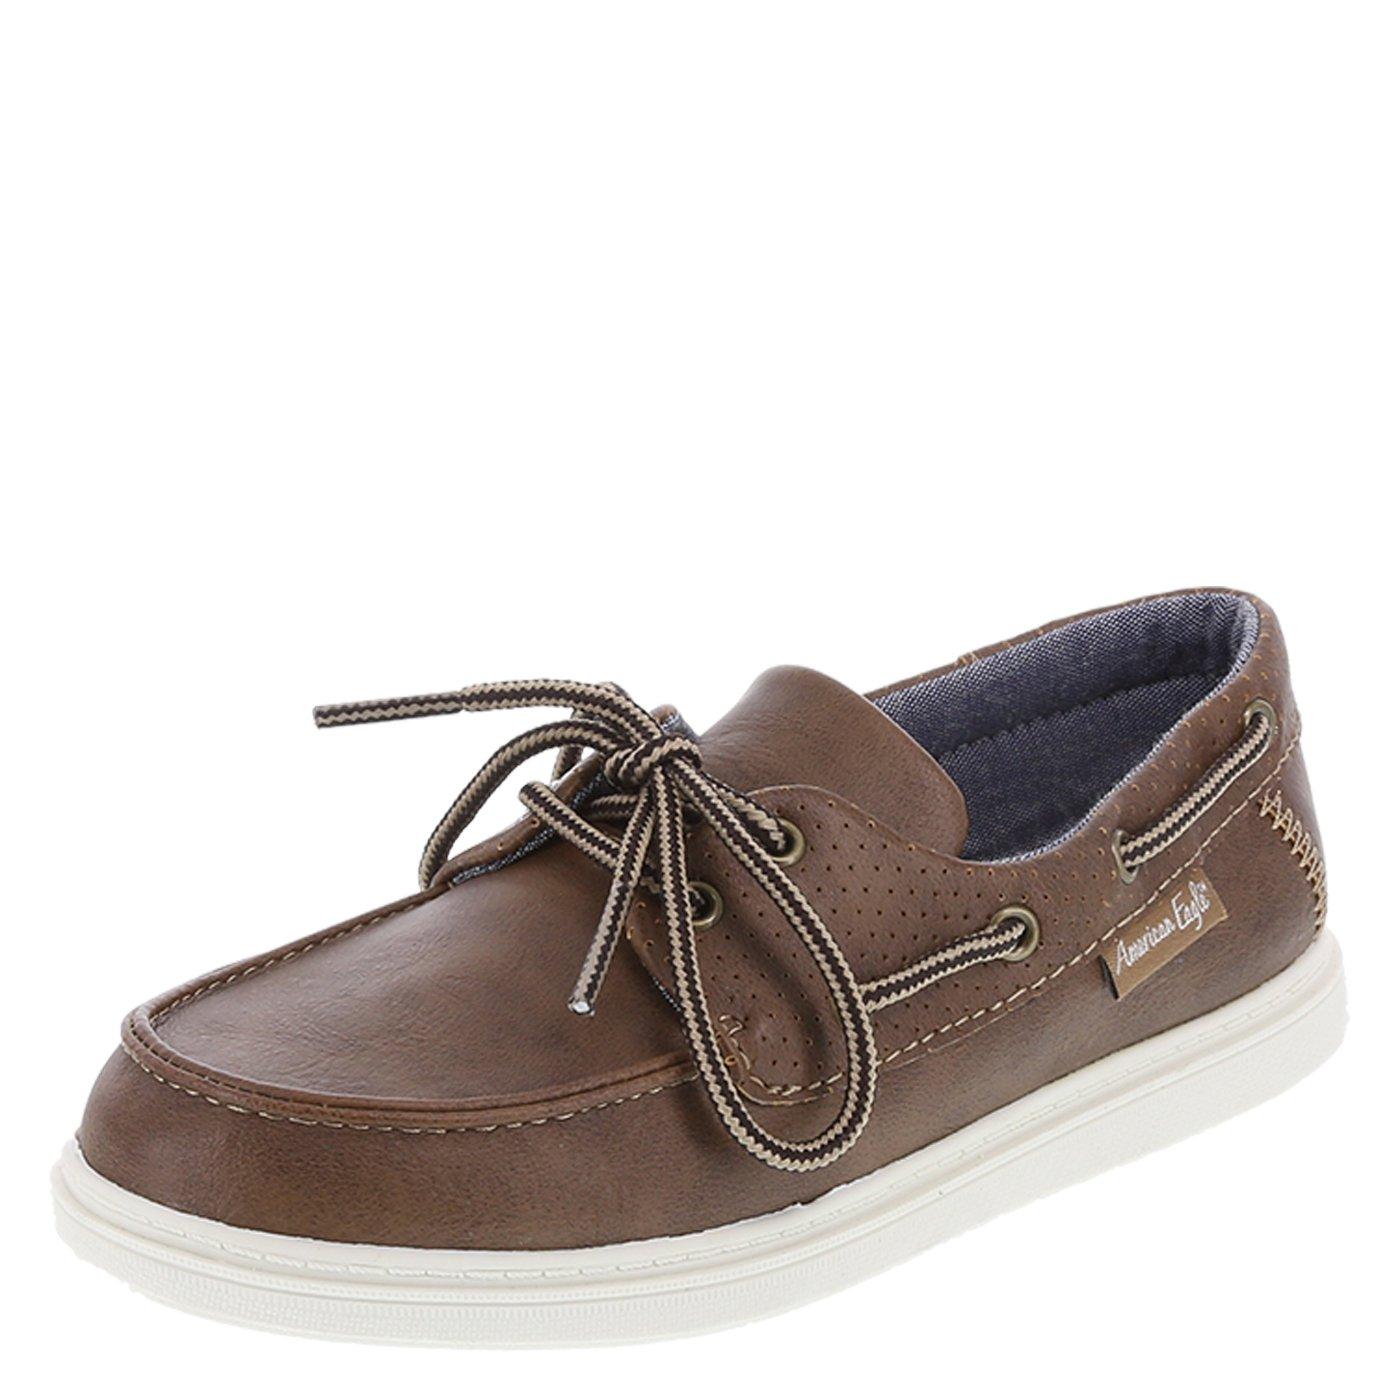 SmartFit Boys' Bently Boat Shoes 079395-Parent